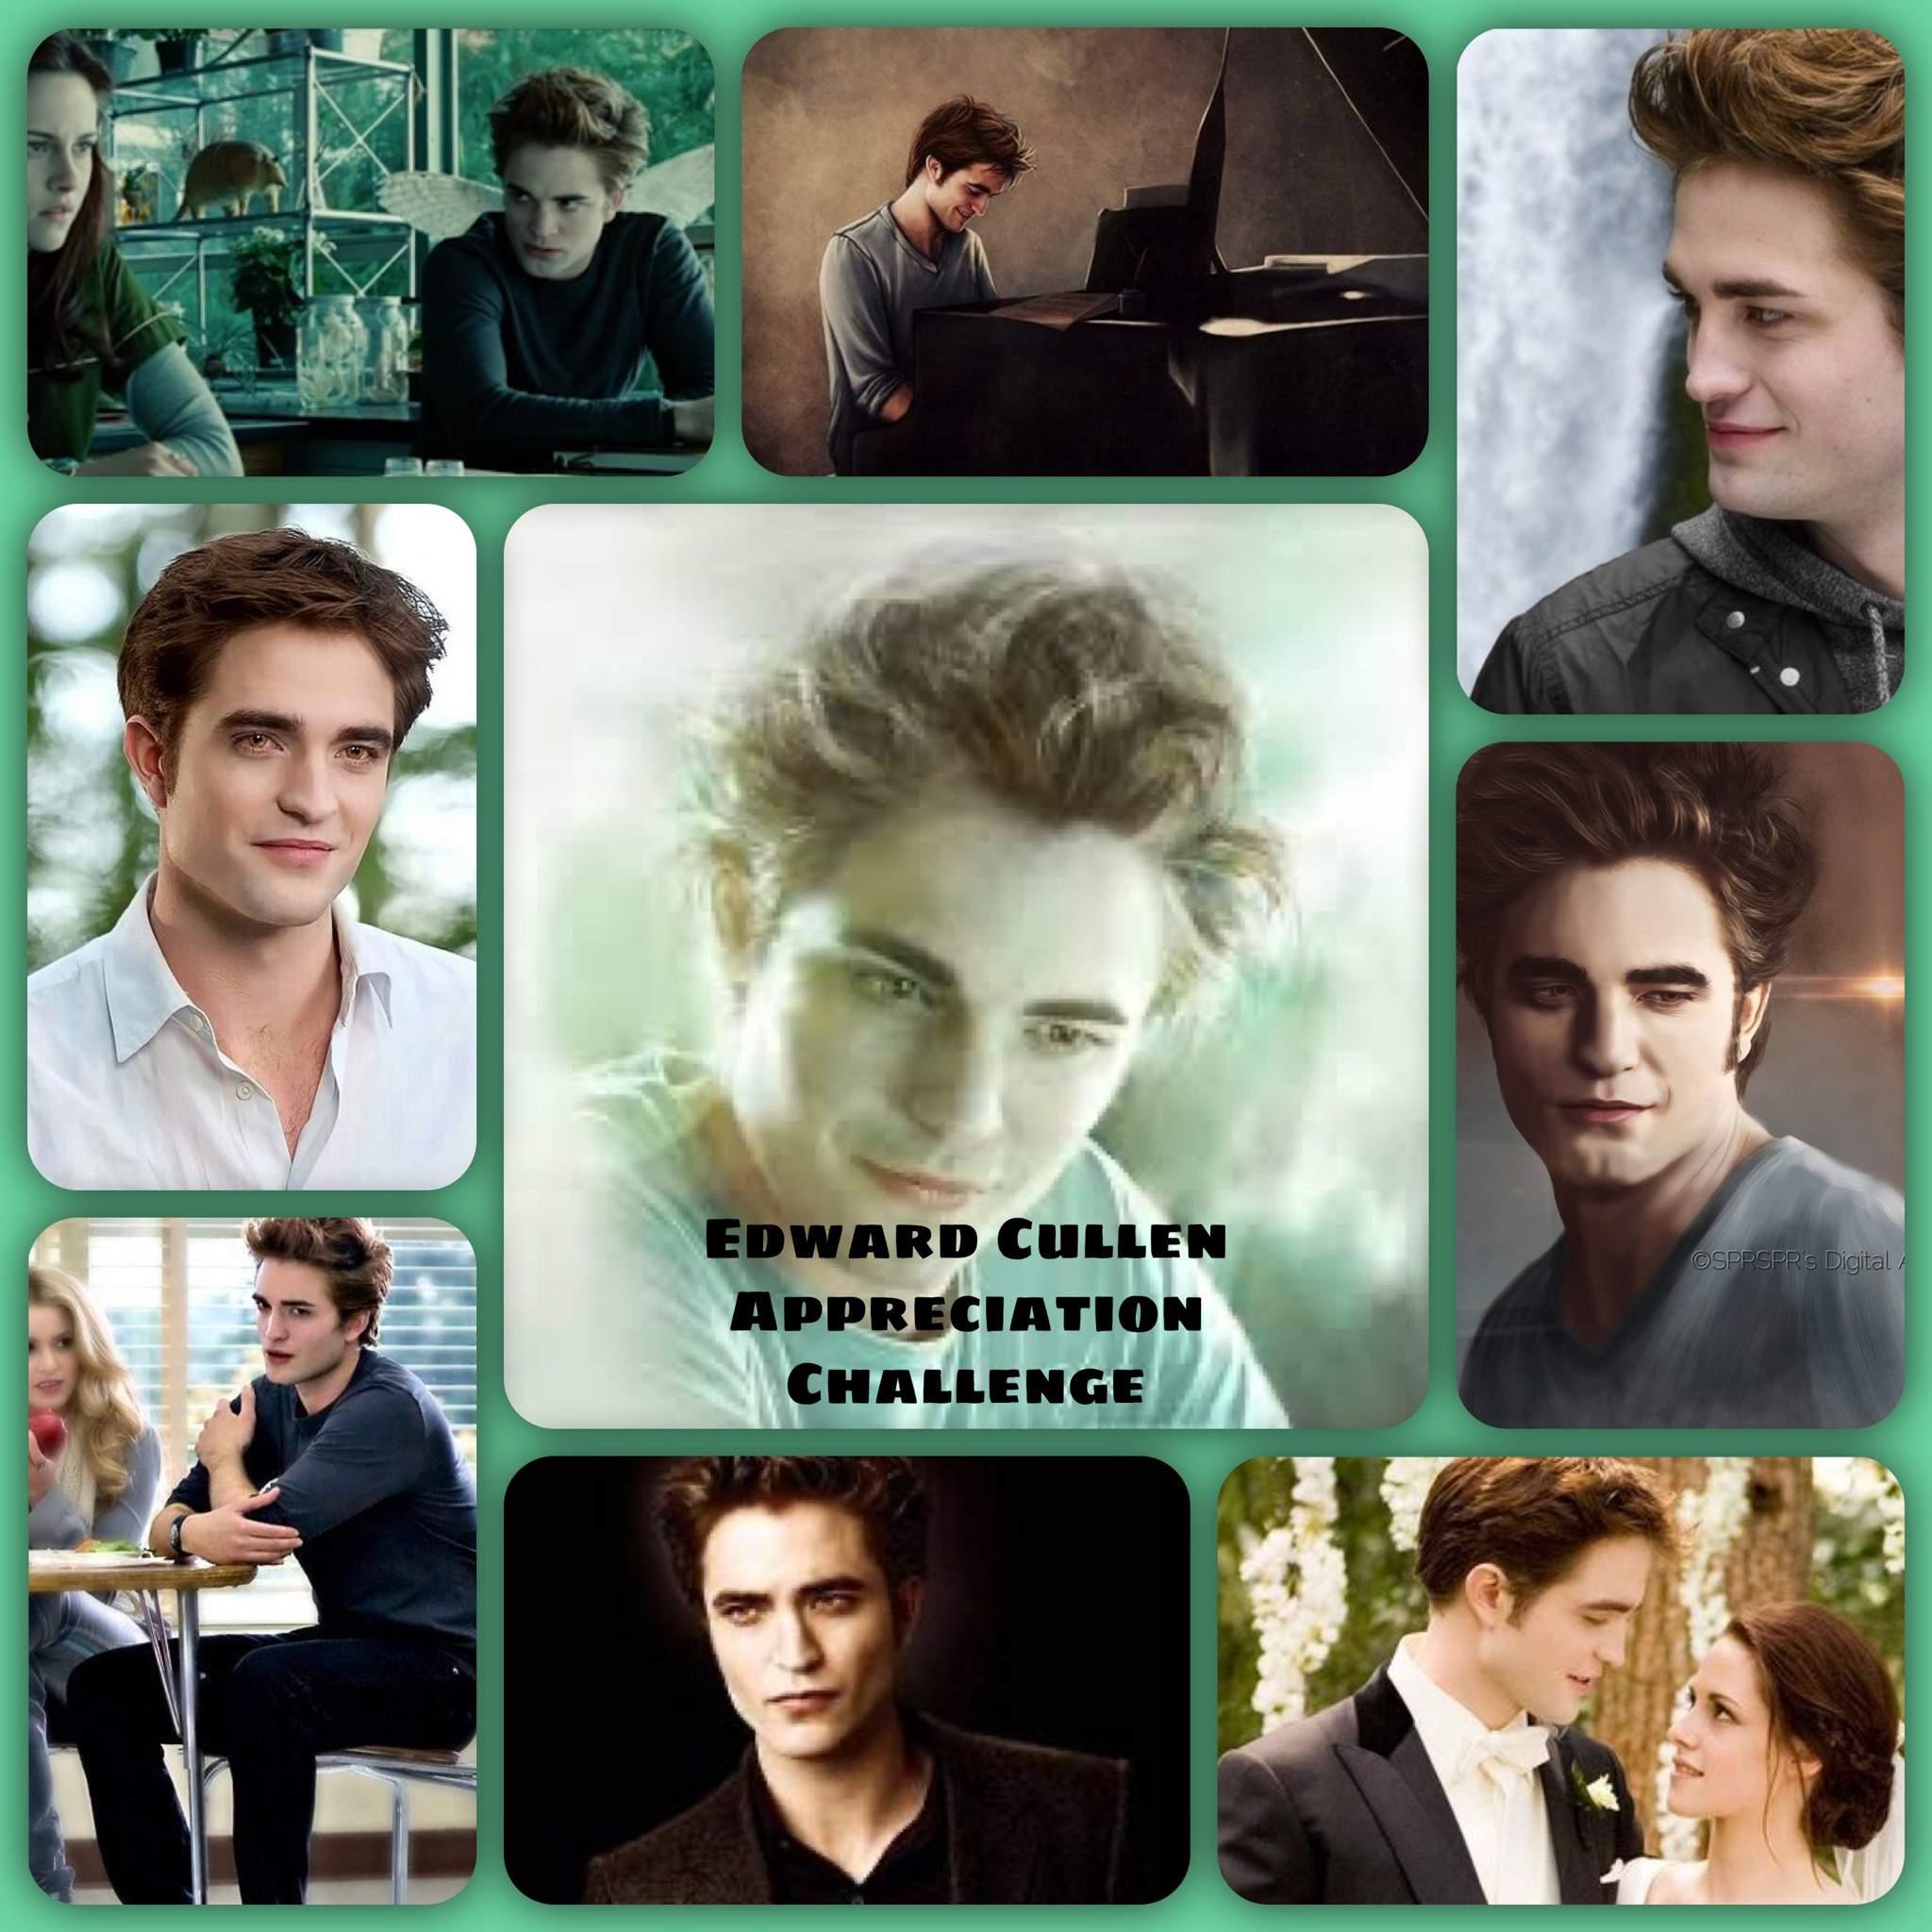 Edward Cullen Appreciation Weekend Challenge The Twilight Saga Amino